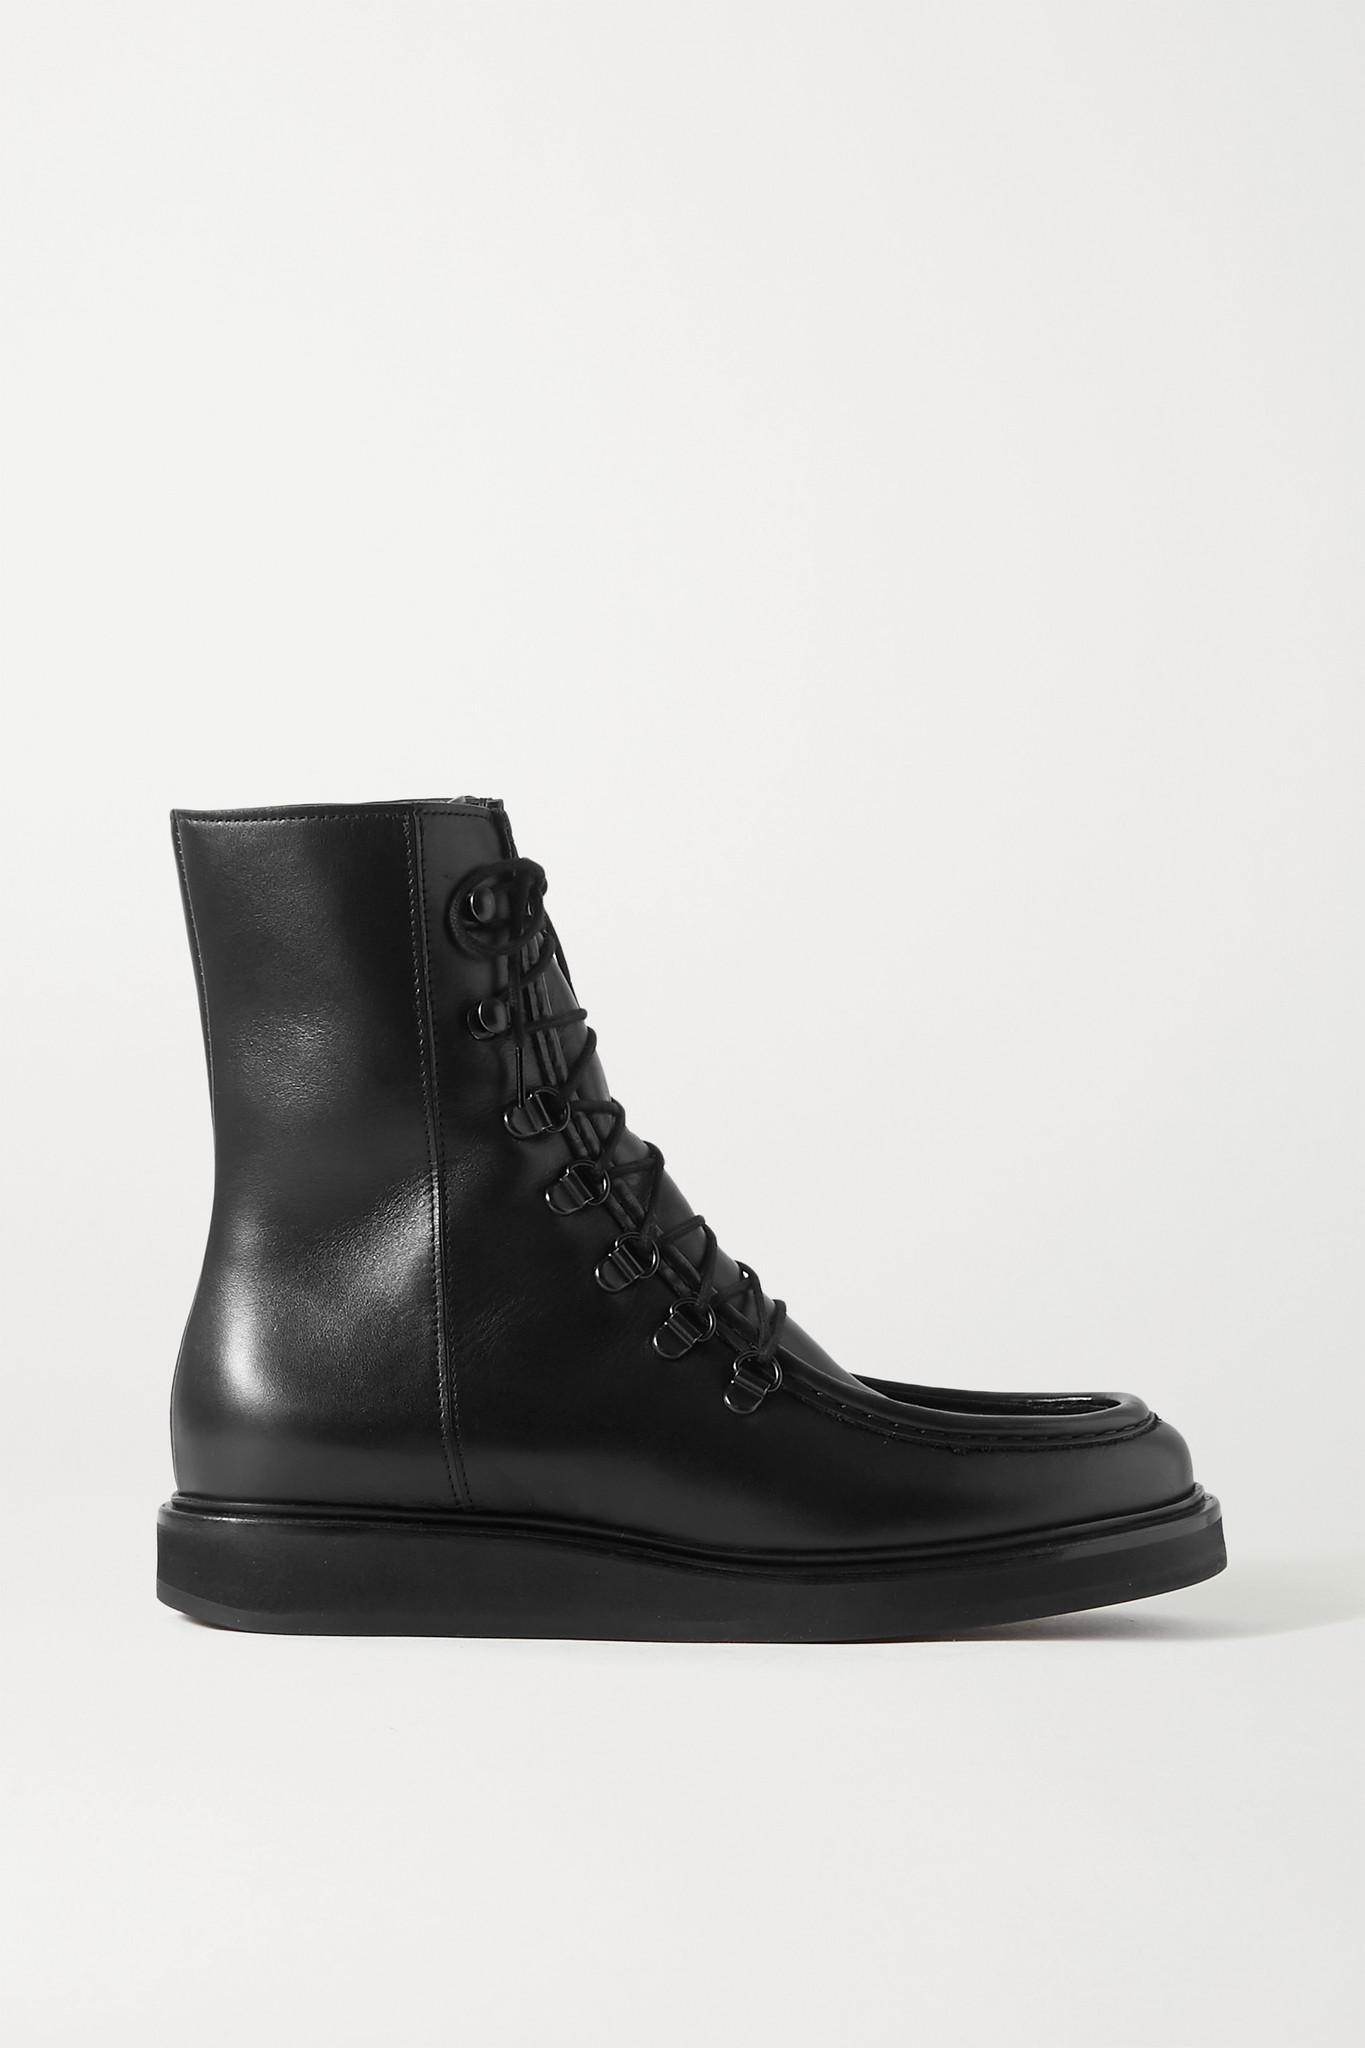 LEGRES - 16 皮革踝靴 - 黑色 - IT41